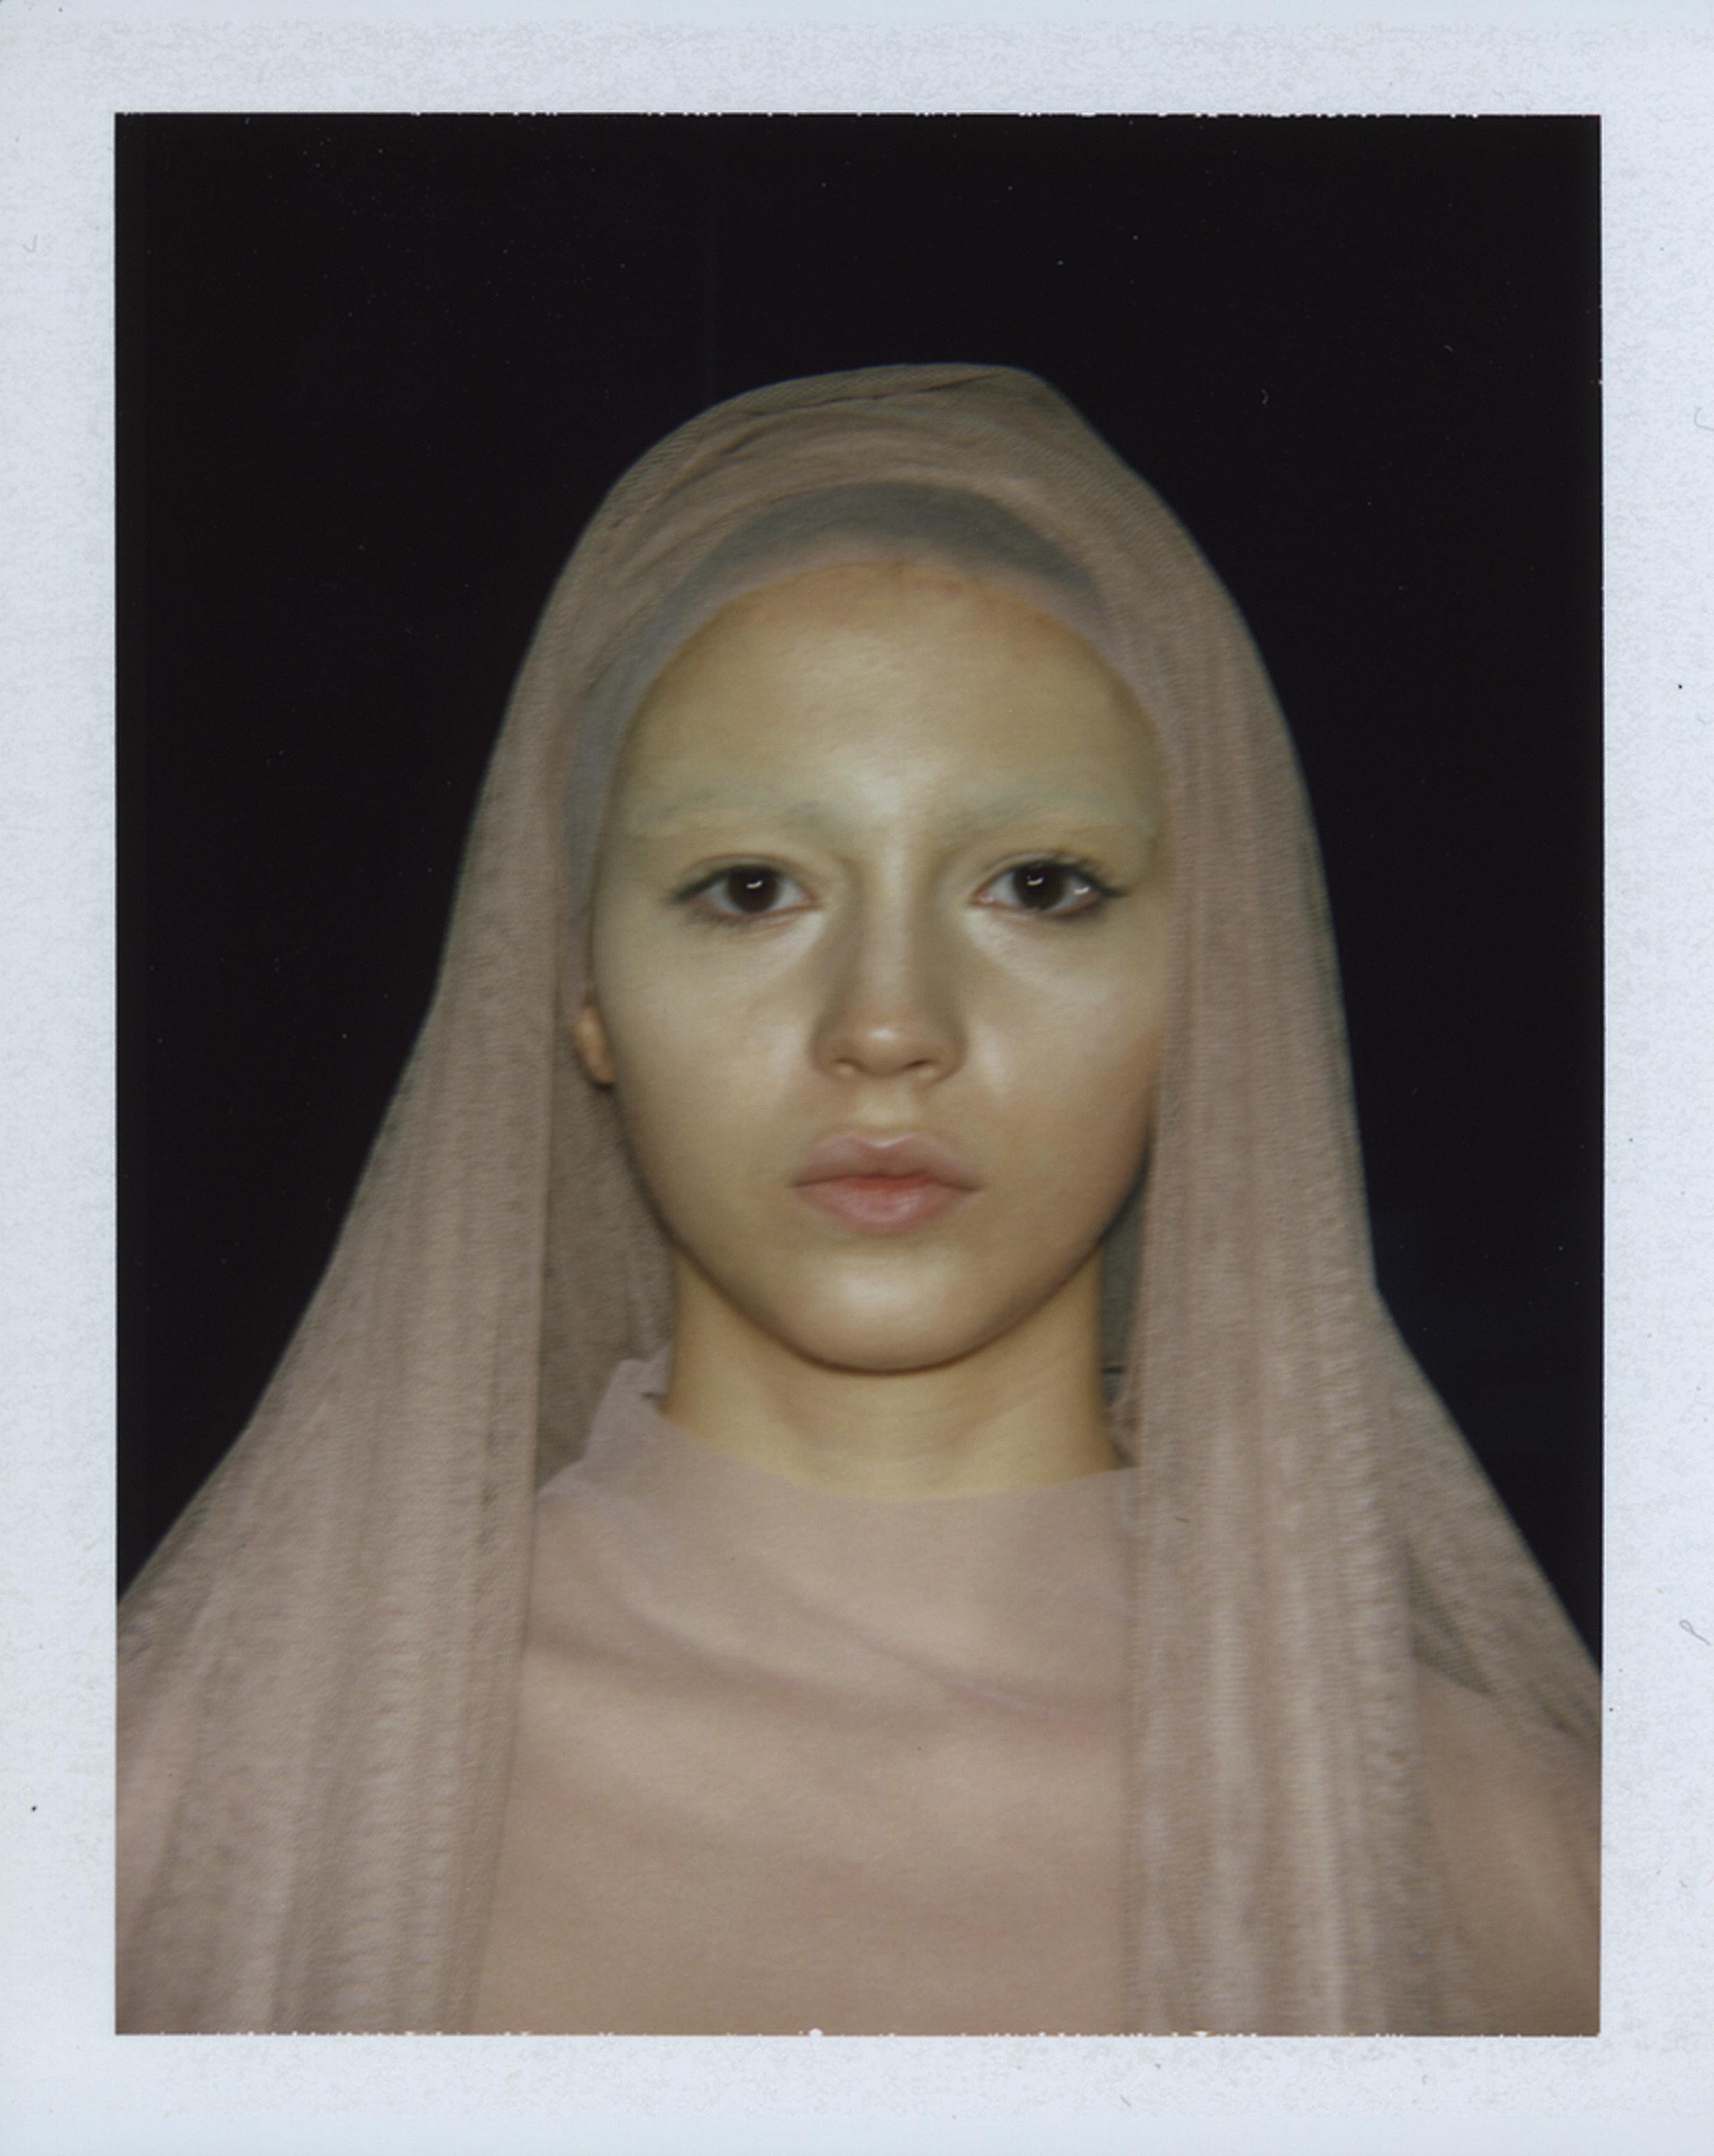 Vanessa Beecroft, vb.74.pol.vb.203, MAXXI Rome, 2014, © 2016 Vanessa Beecroft